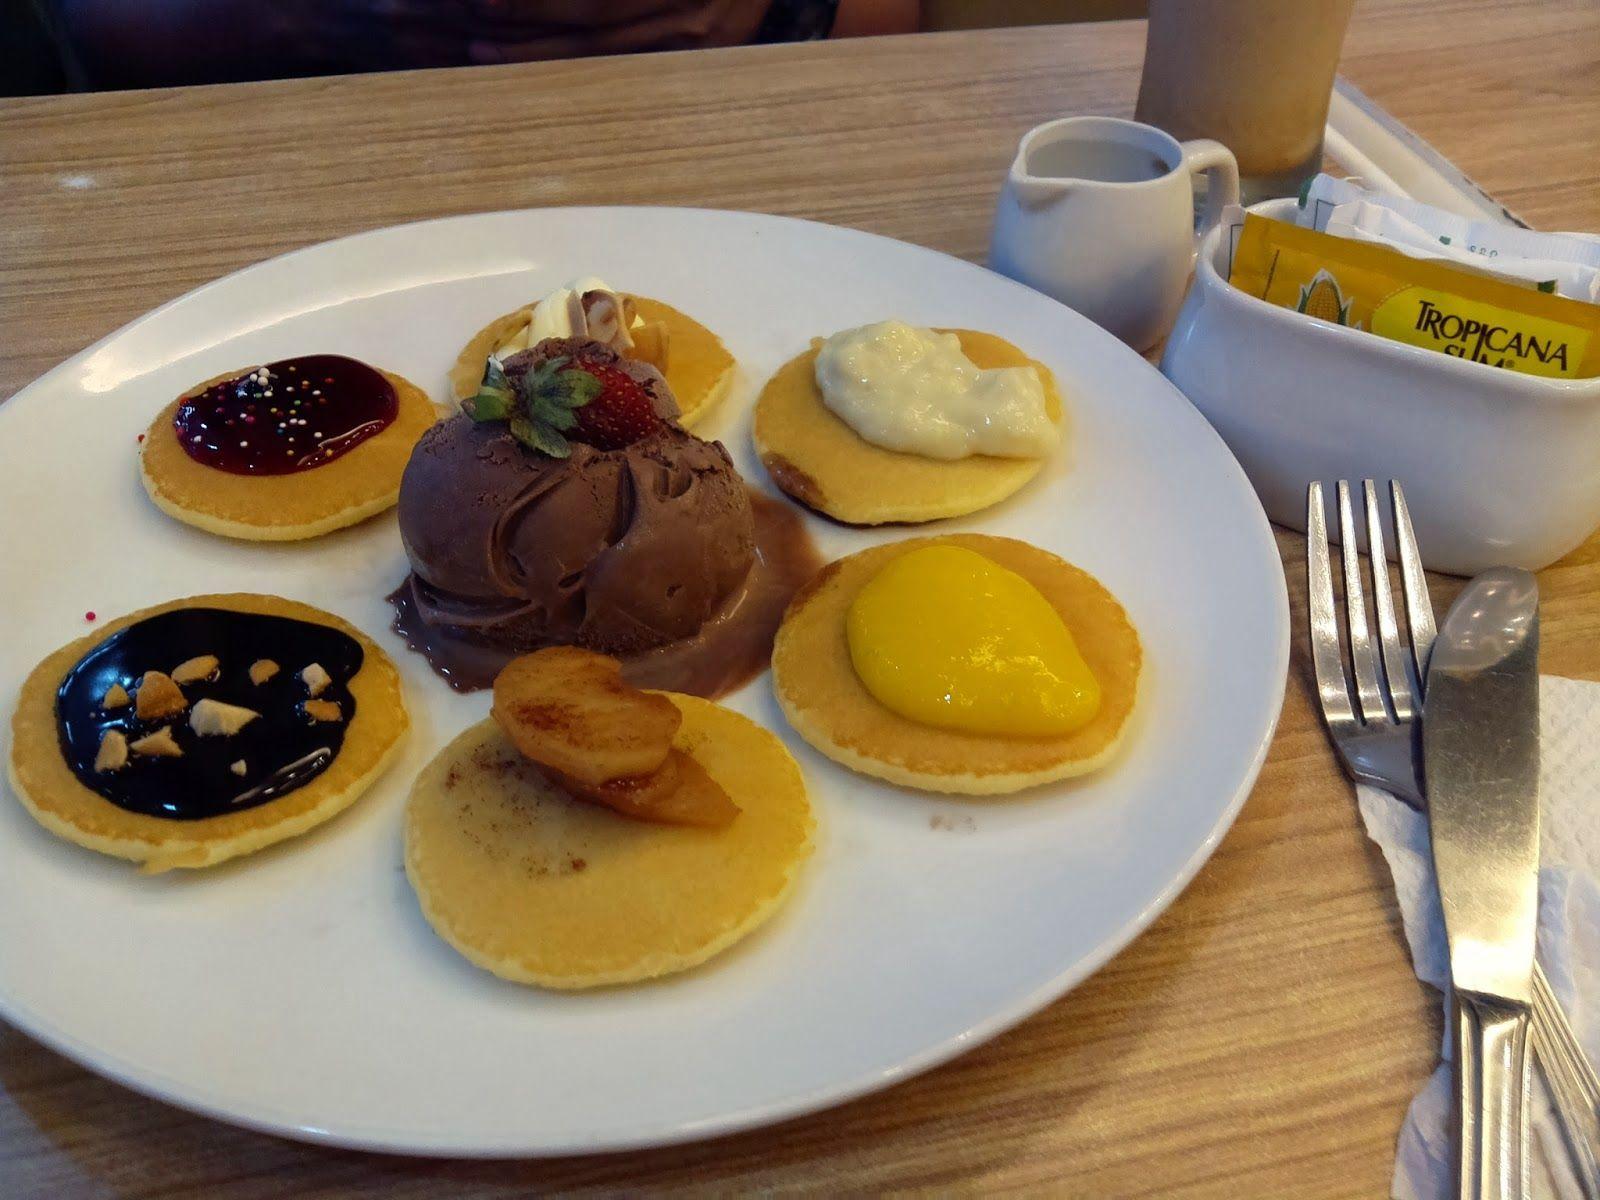 Kelezatan di Balik MenuMenu Pancake dari Mr. Pancake